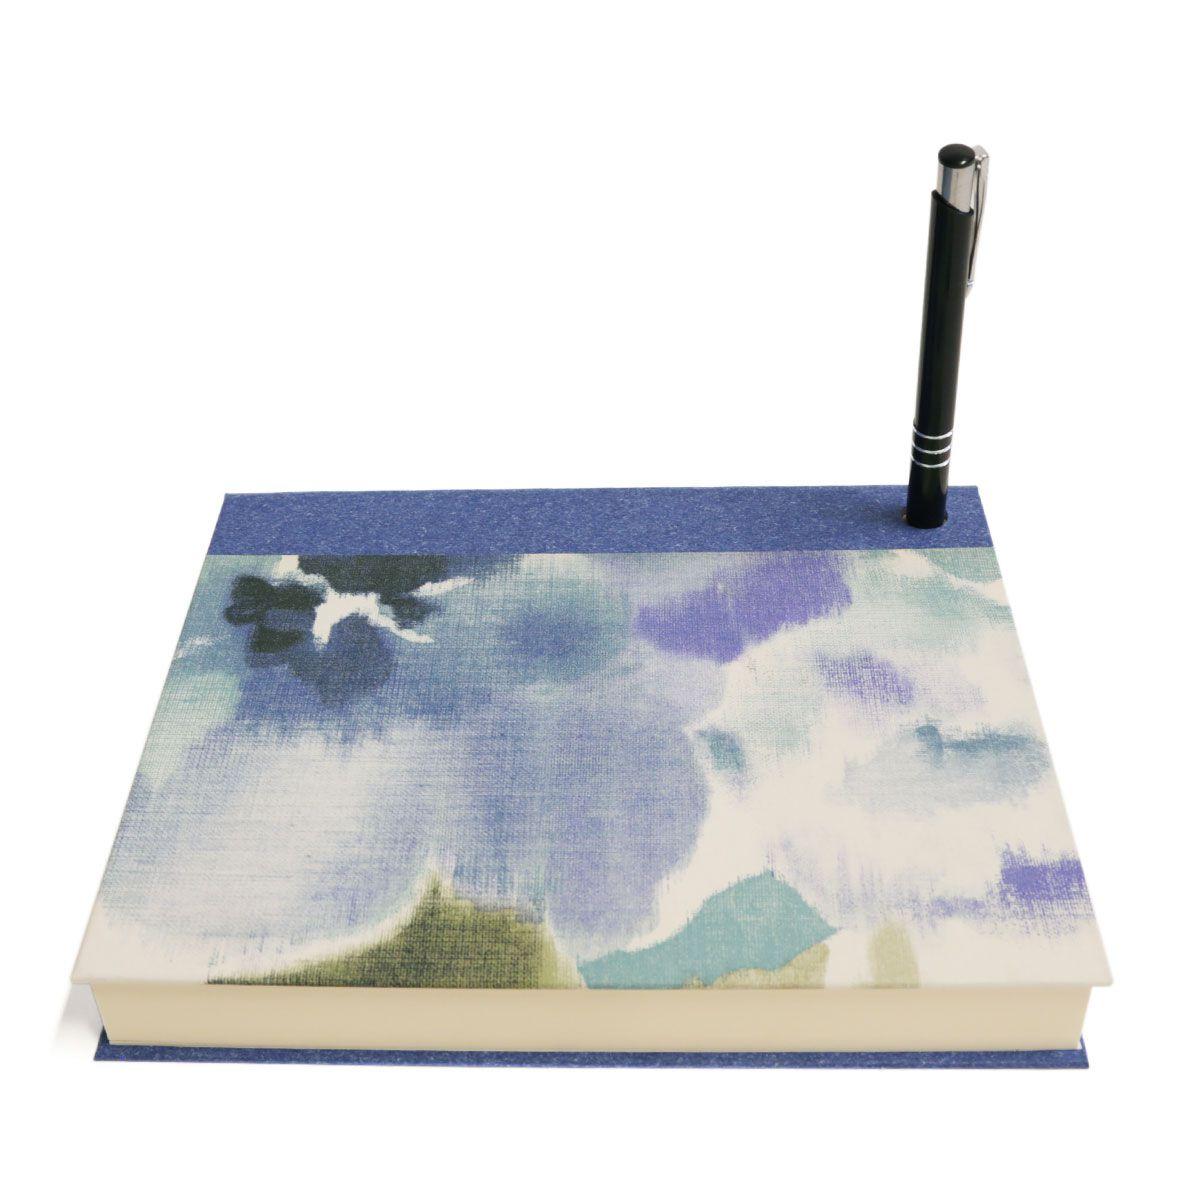 Bloco de desenho (Florear Azul)